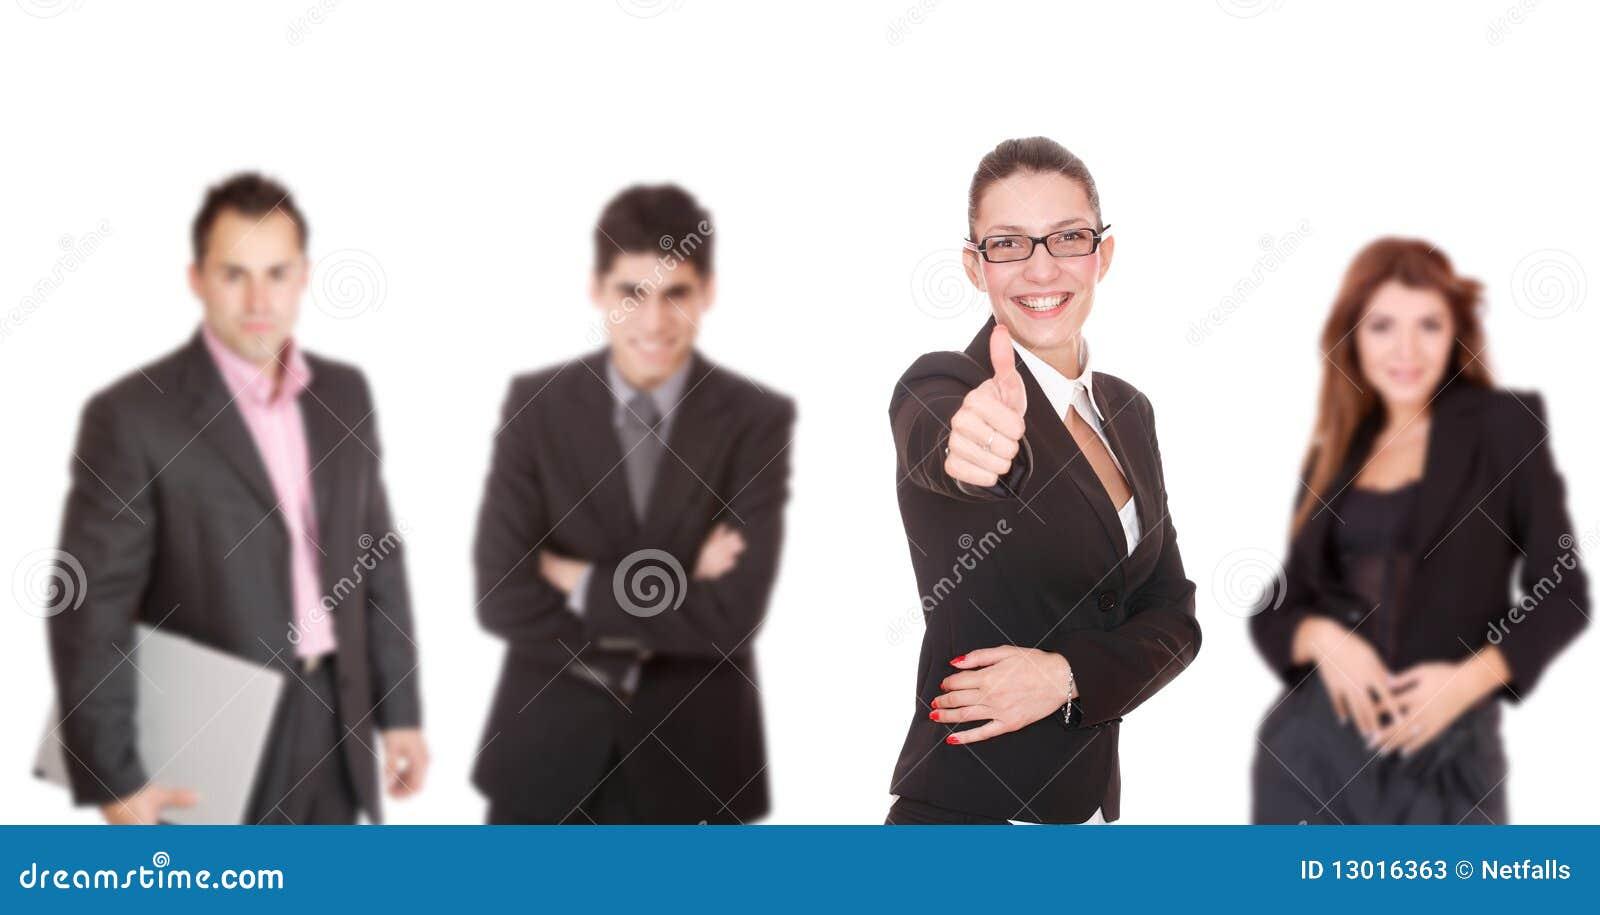 12 Characteristics of Successful Management Teams